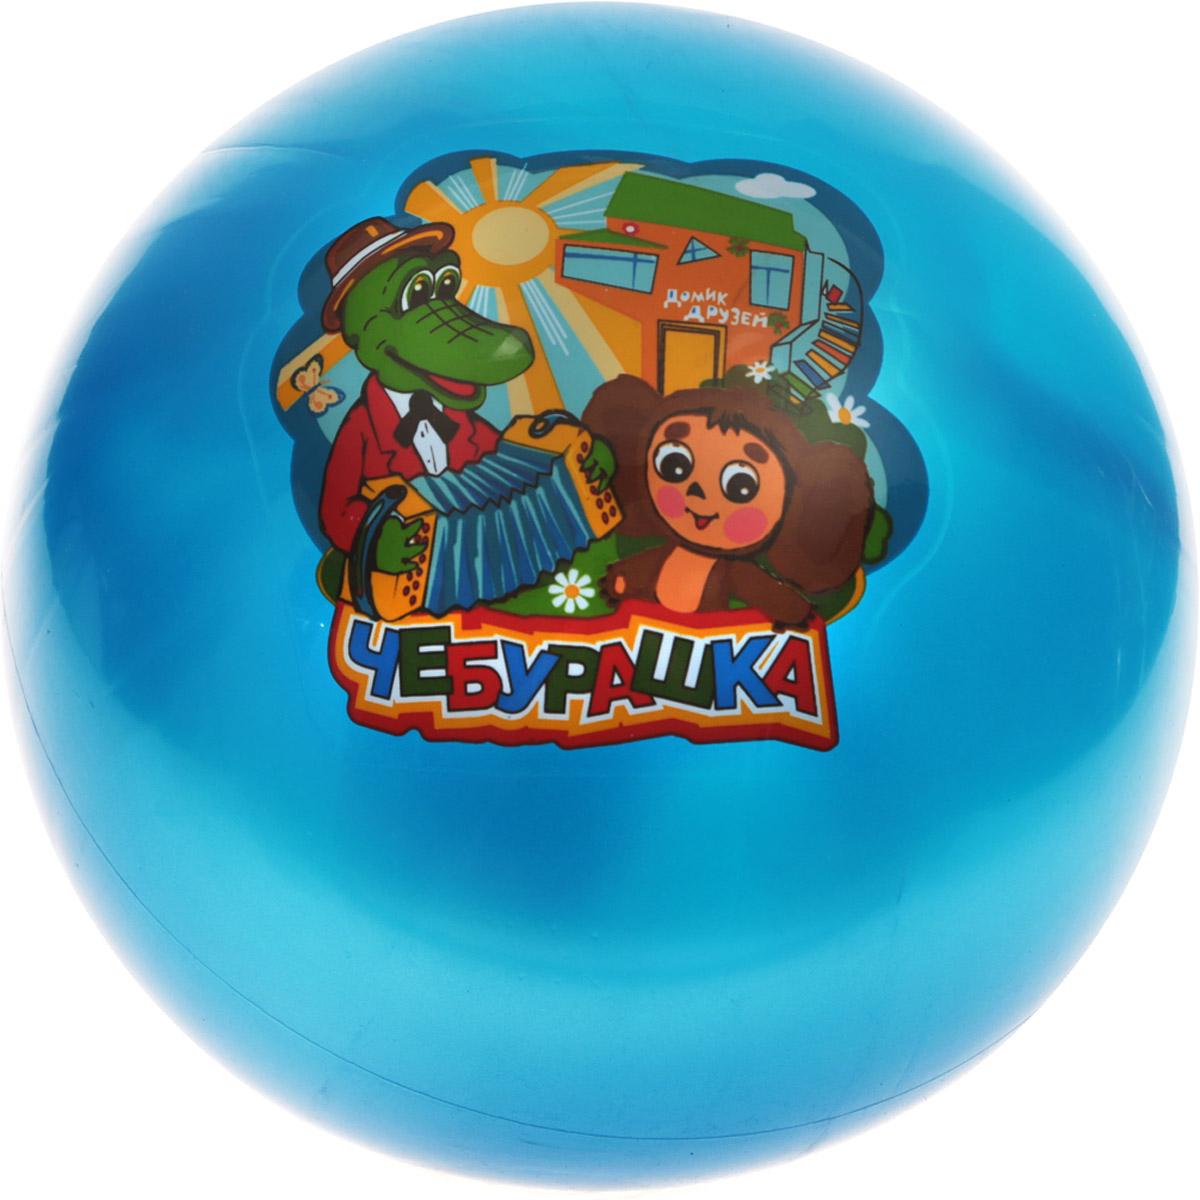 Играем вместе Мяч Чебурашка цвет синий 23 см AD-9(CH)_синий